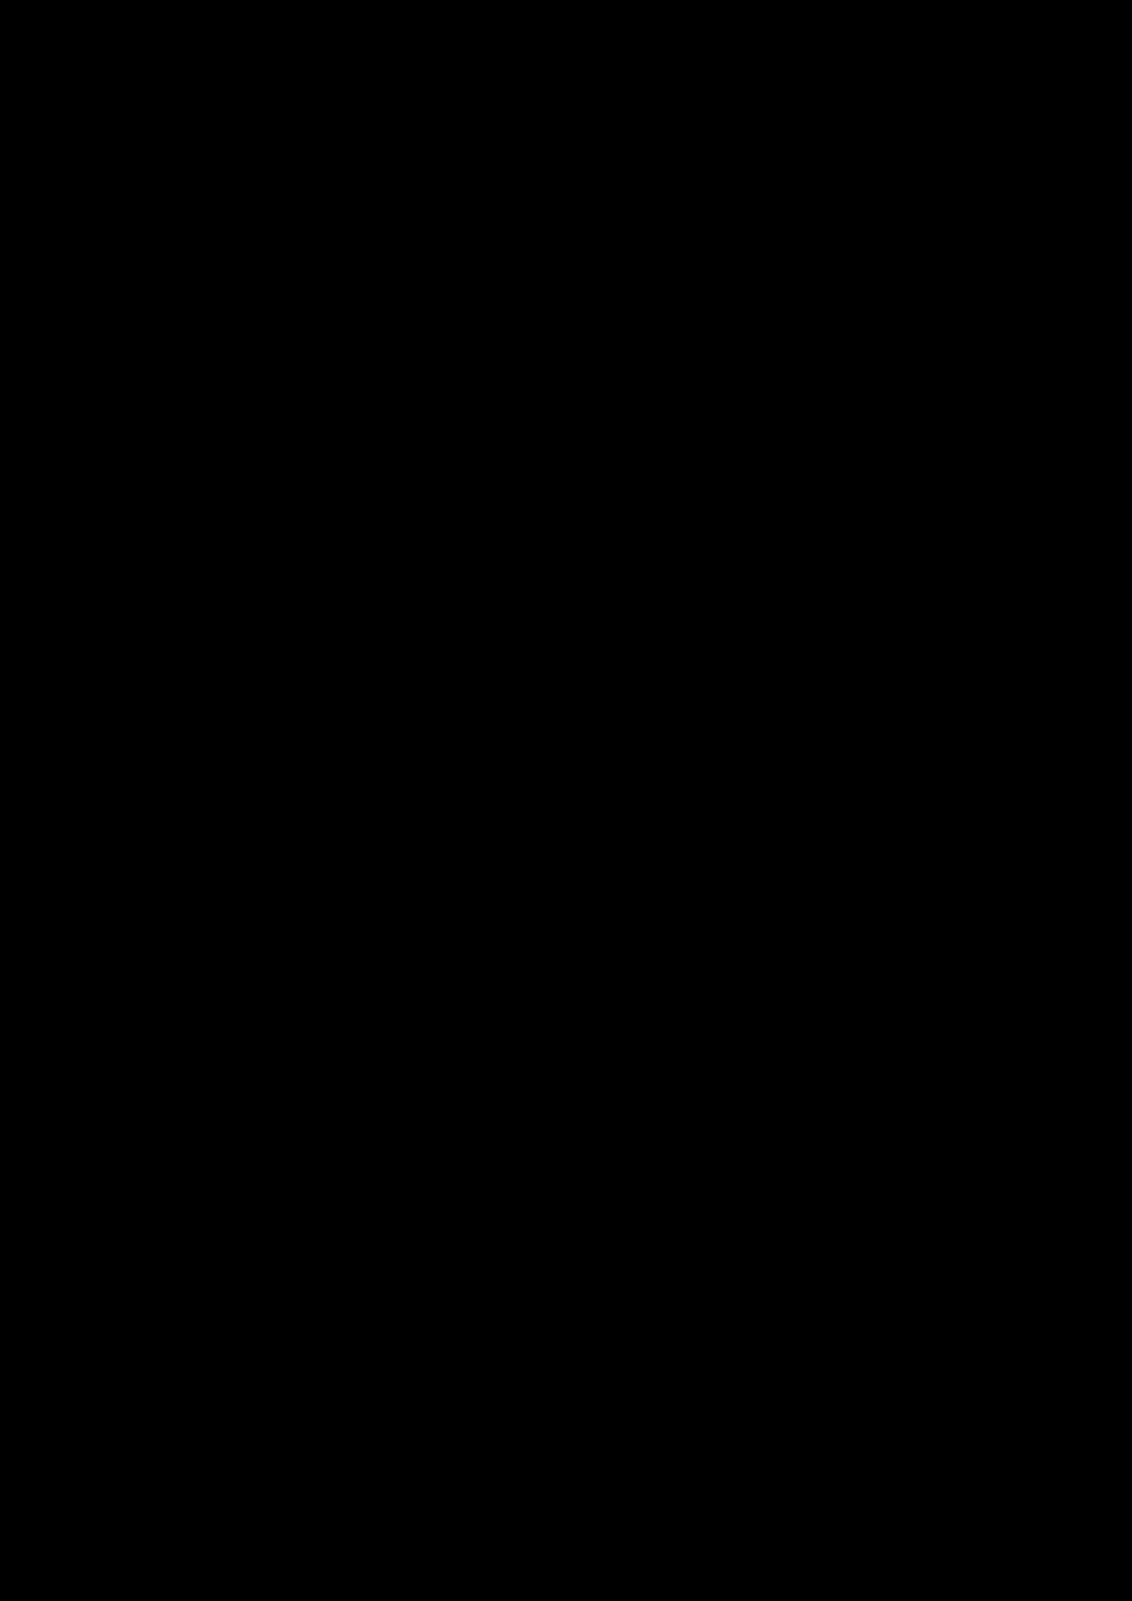 N.A.S.T.YA slide, Image 49